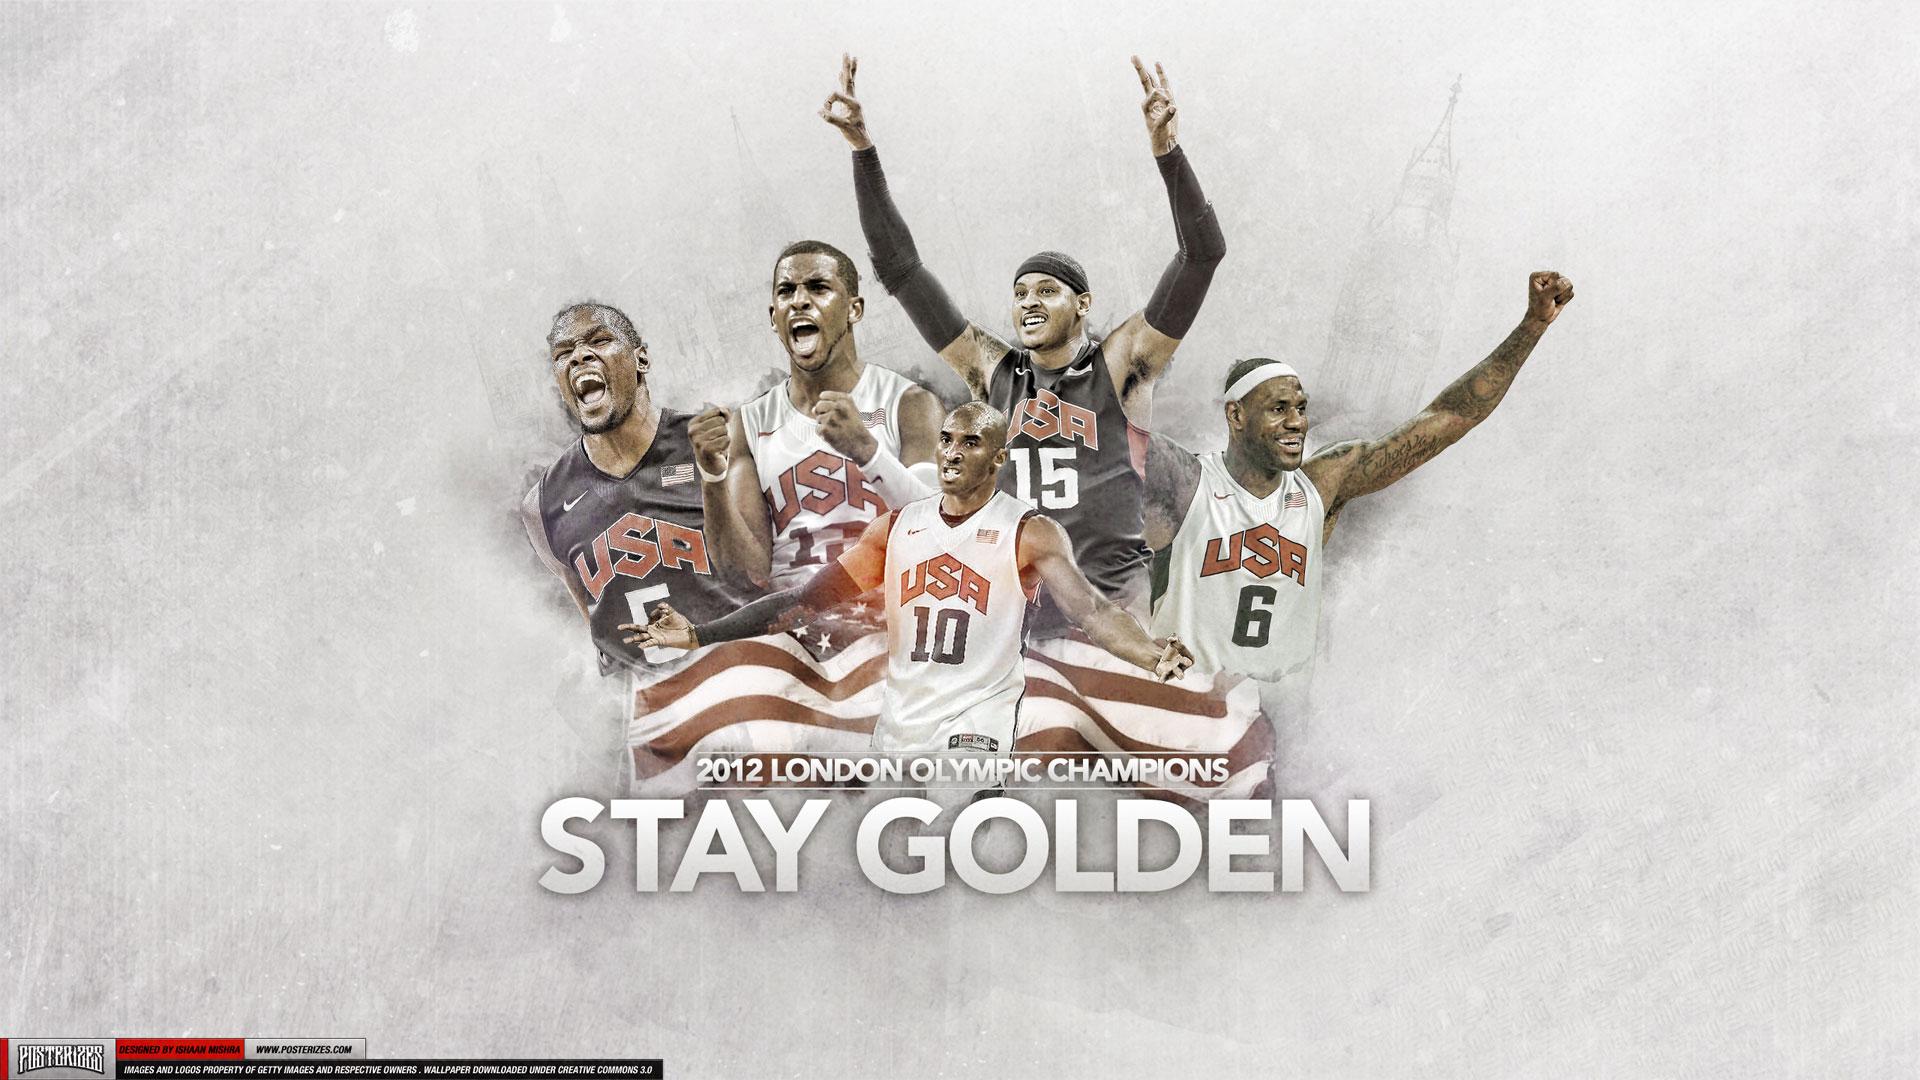 2012 Dream Team Olympics Gold 19201080 Wallpaper Basketball 1920x1080